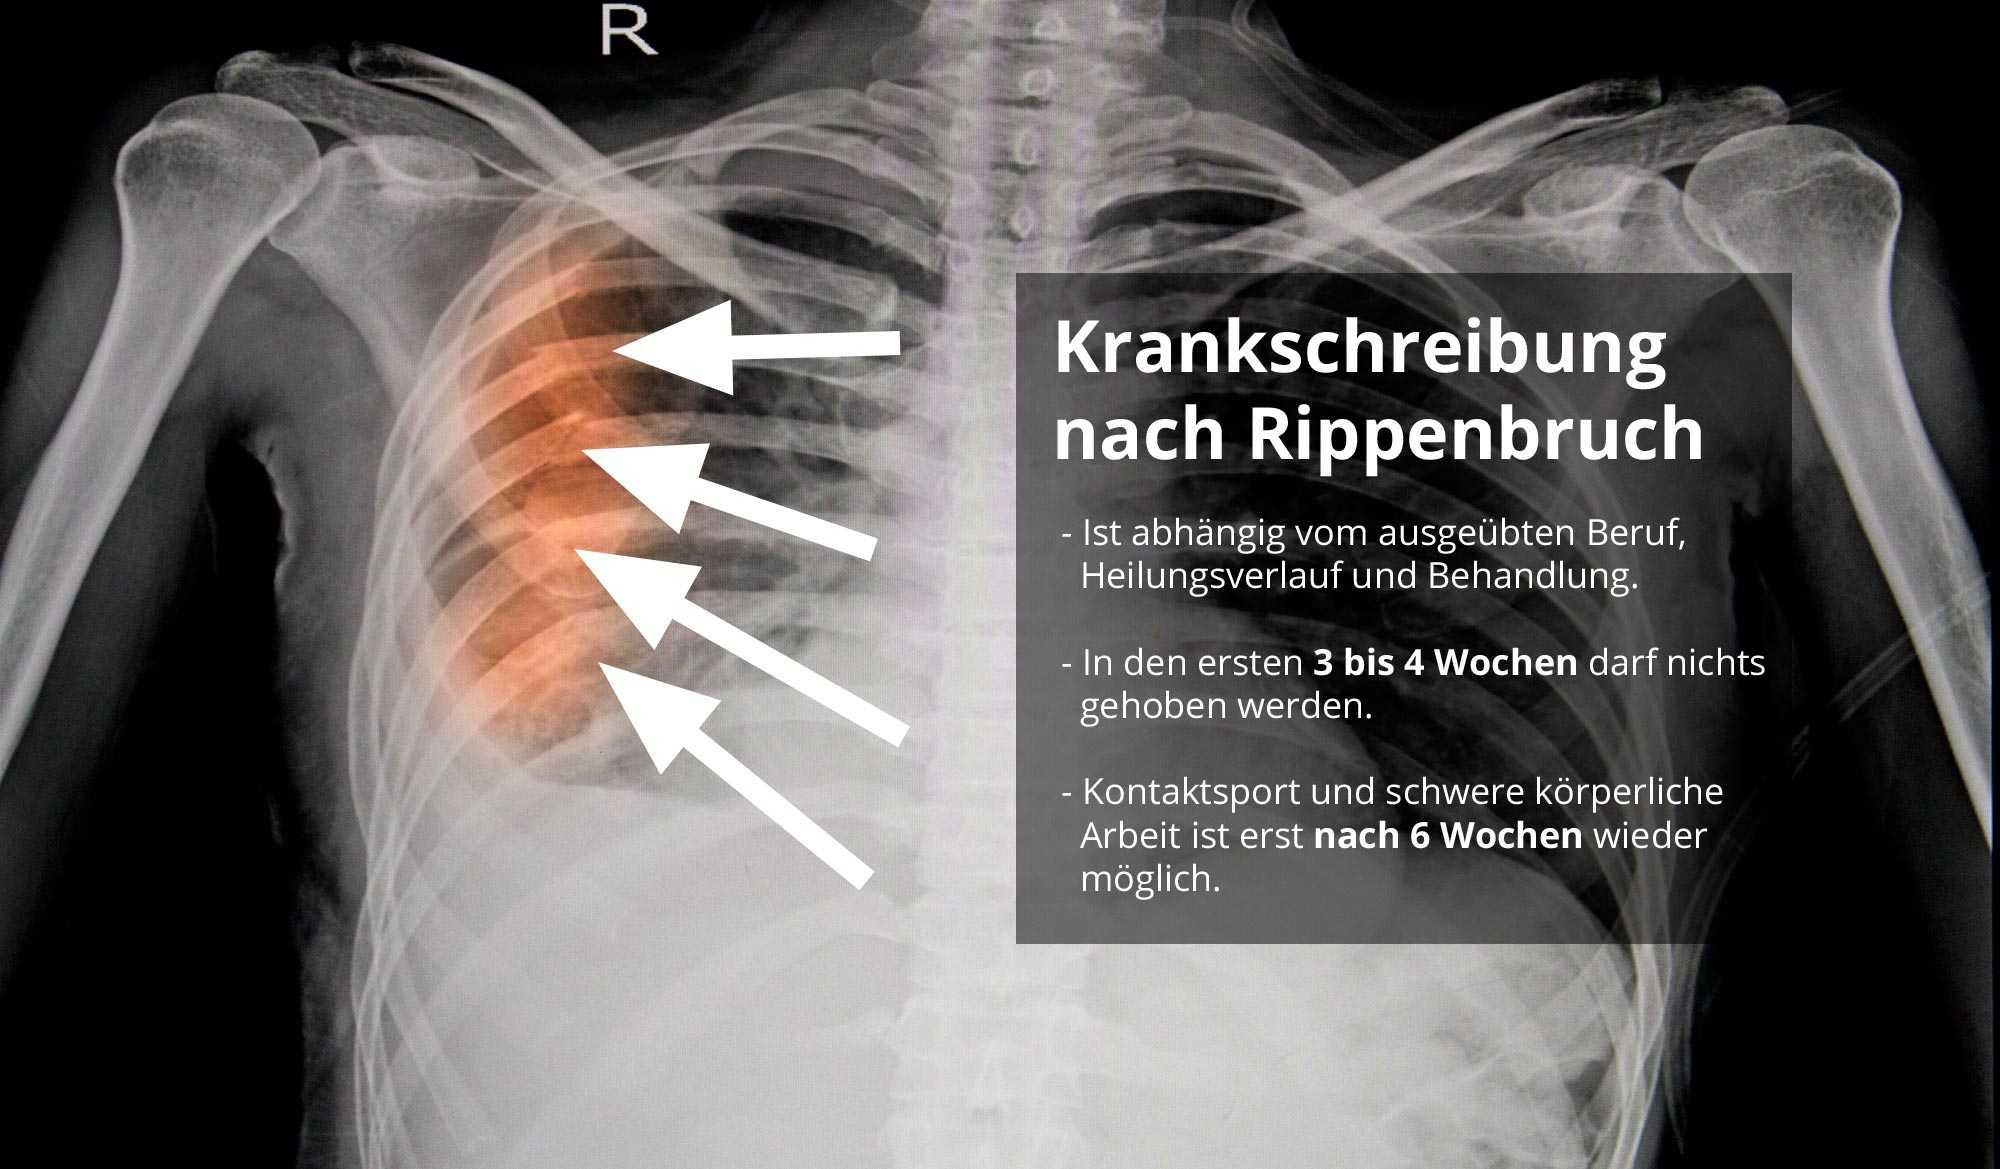 Gebrochen was tun rippe Rippe documents.openideo.com